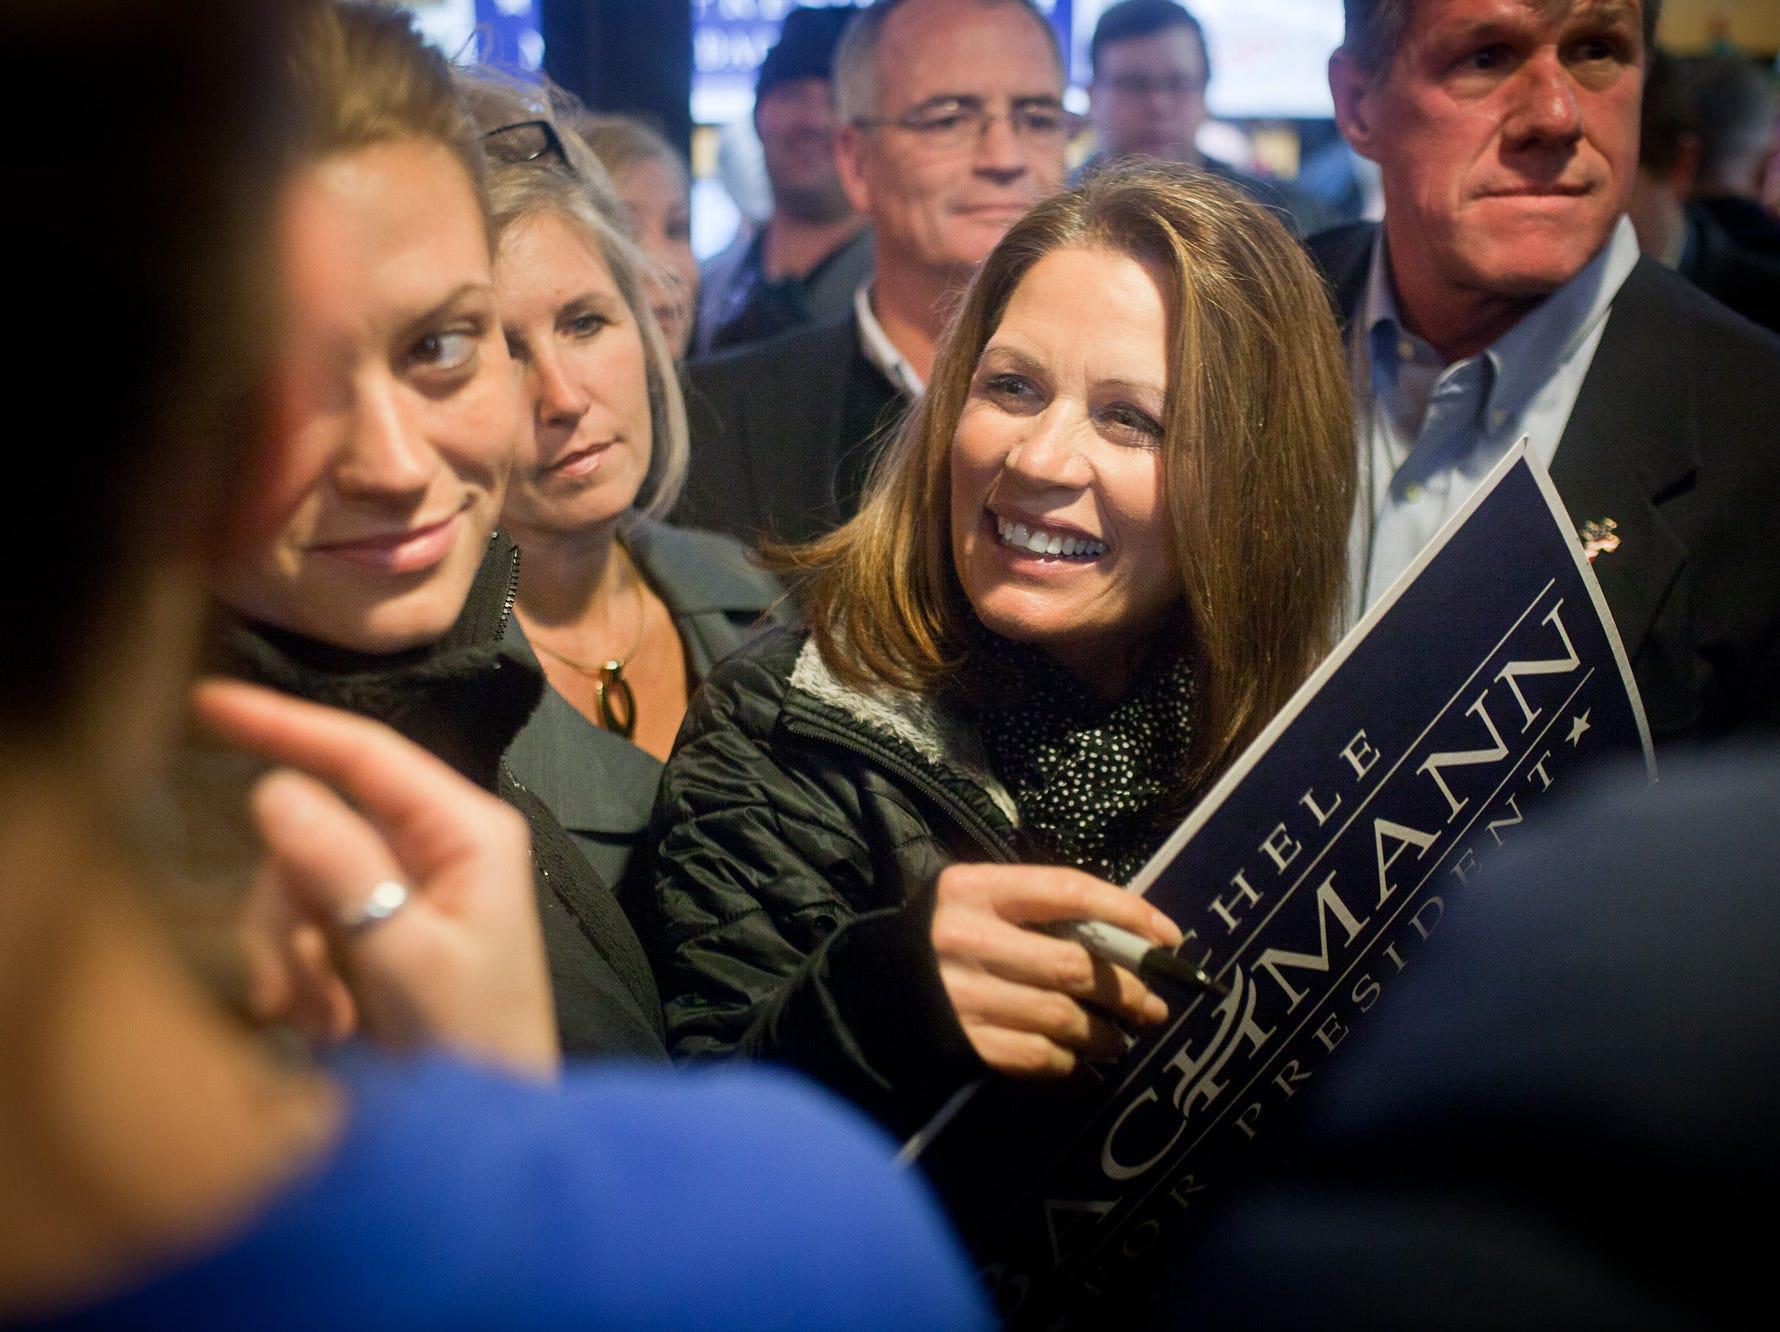 Rep. Michele Bachmann, R-Minn., talks with supporters at Hamburg Inn in Iowa City on Thursday, Dec. 22, 2011.